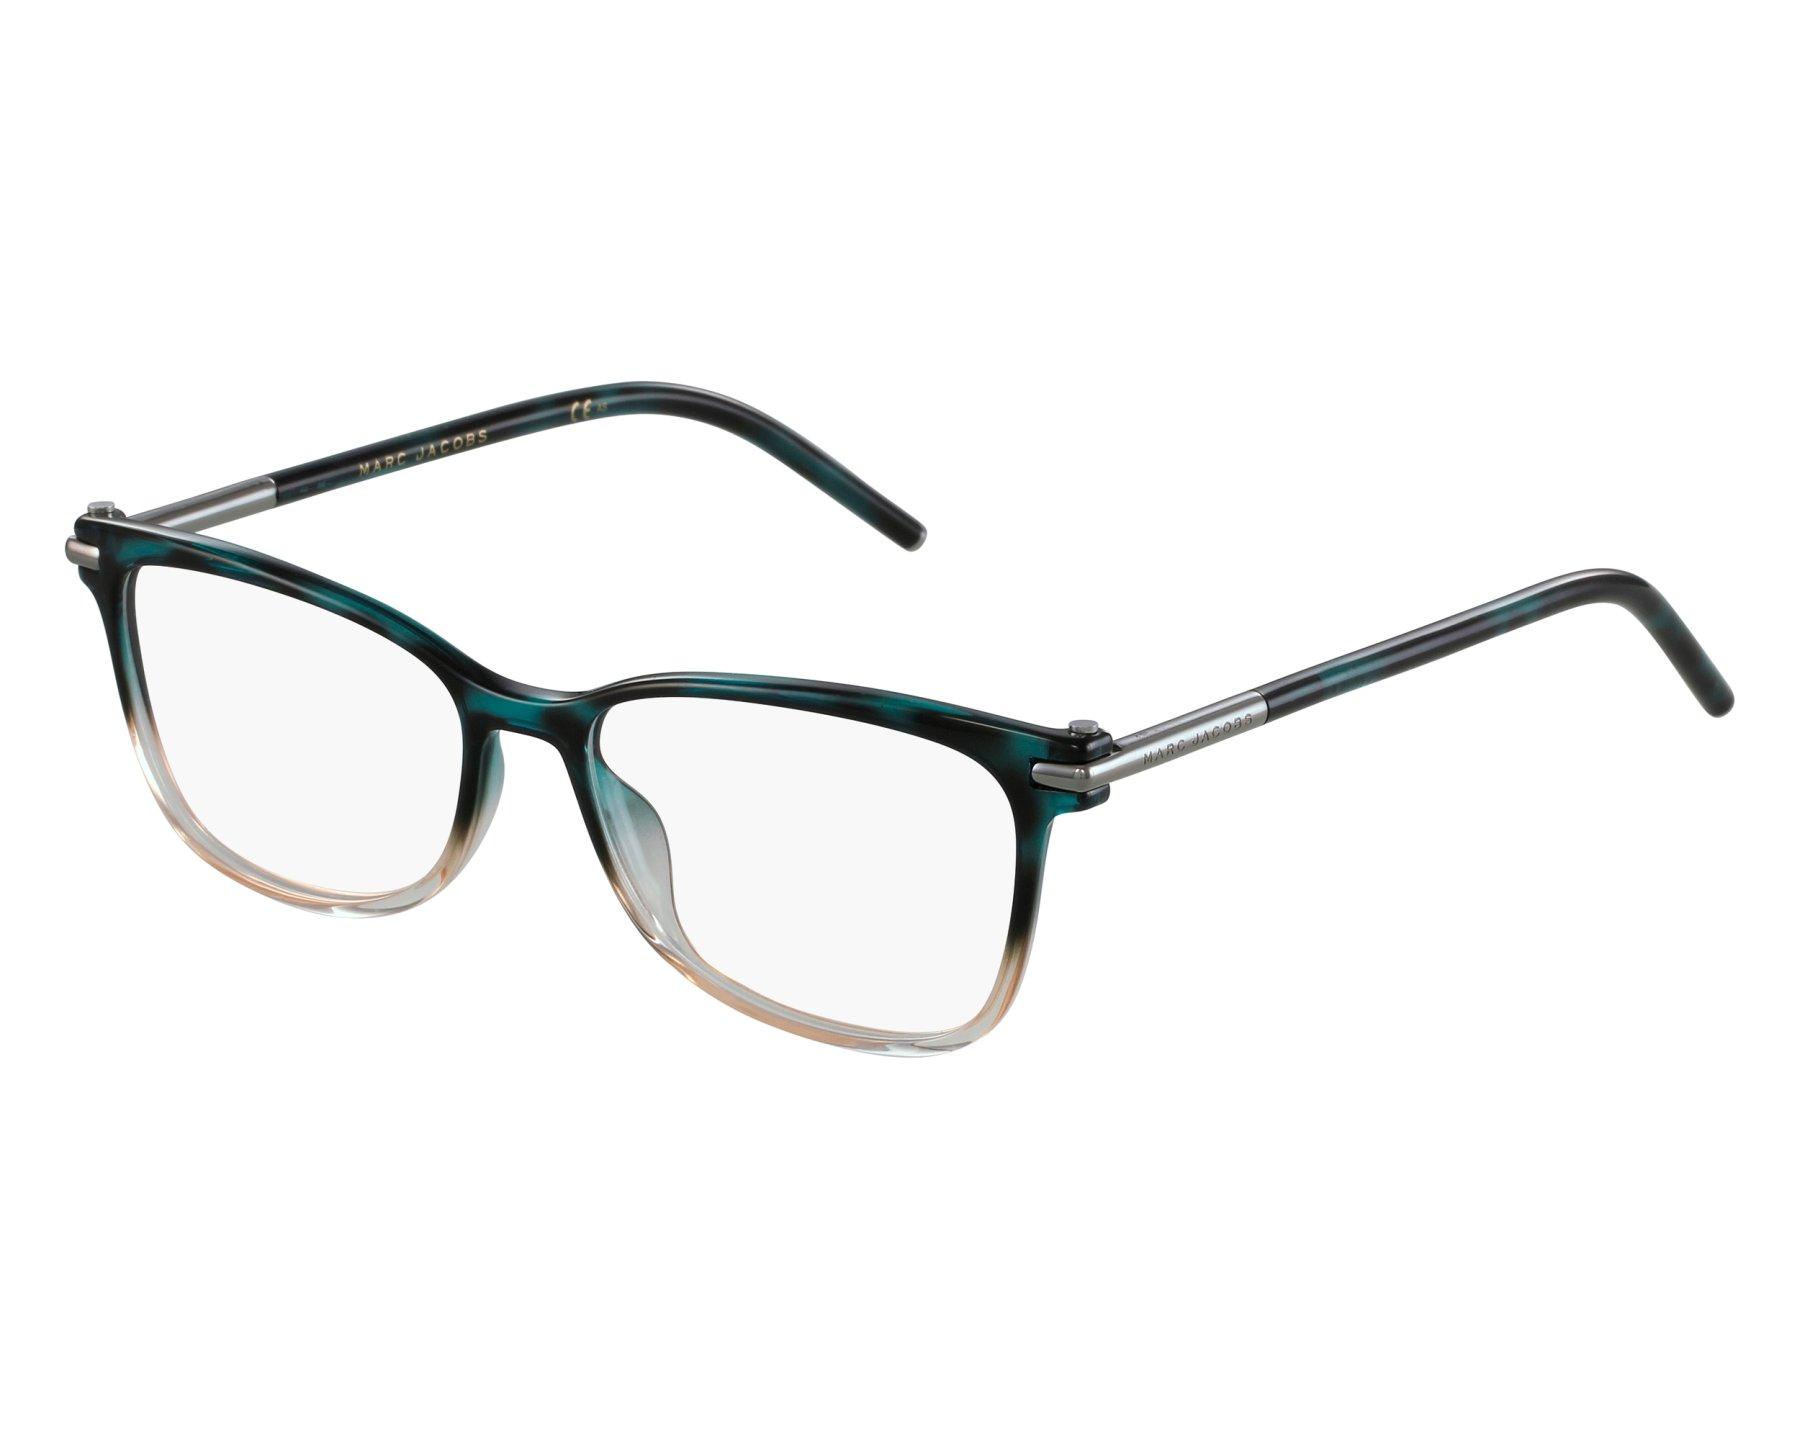 Marc Jacobs Eyeglasses Marc 53 Toz Green